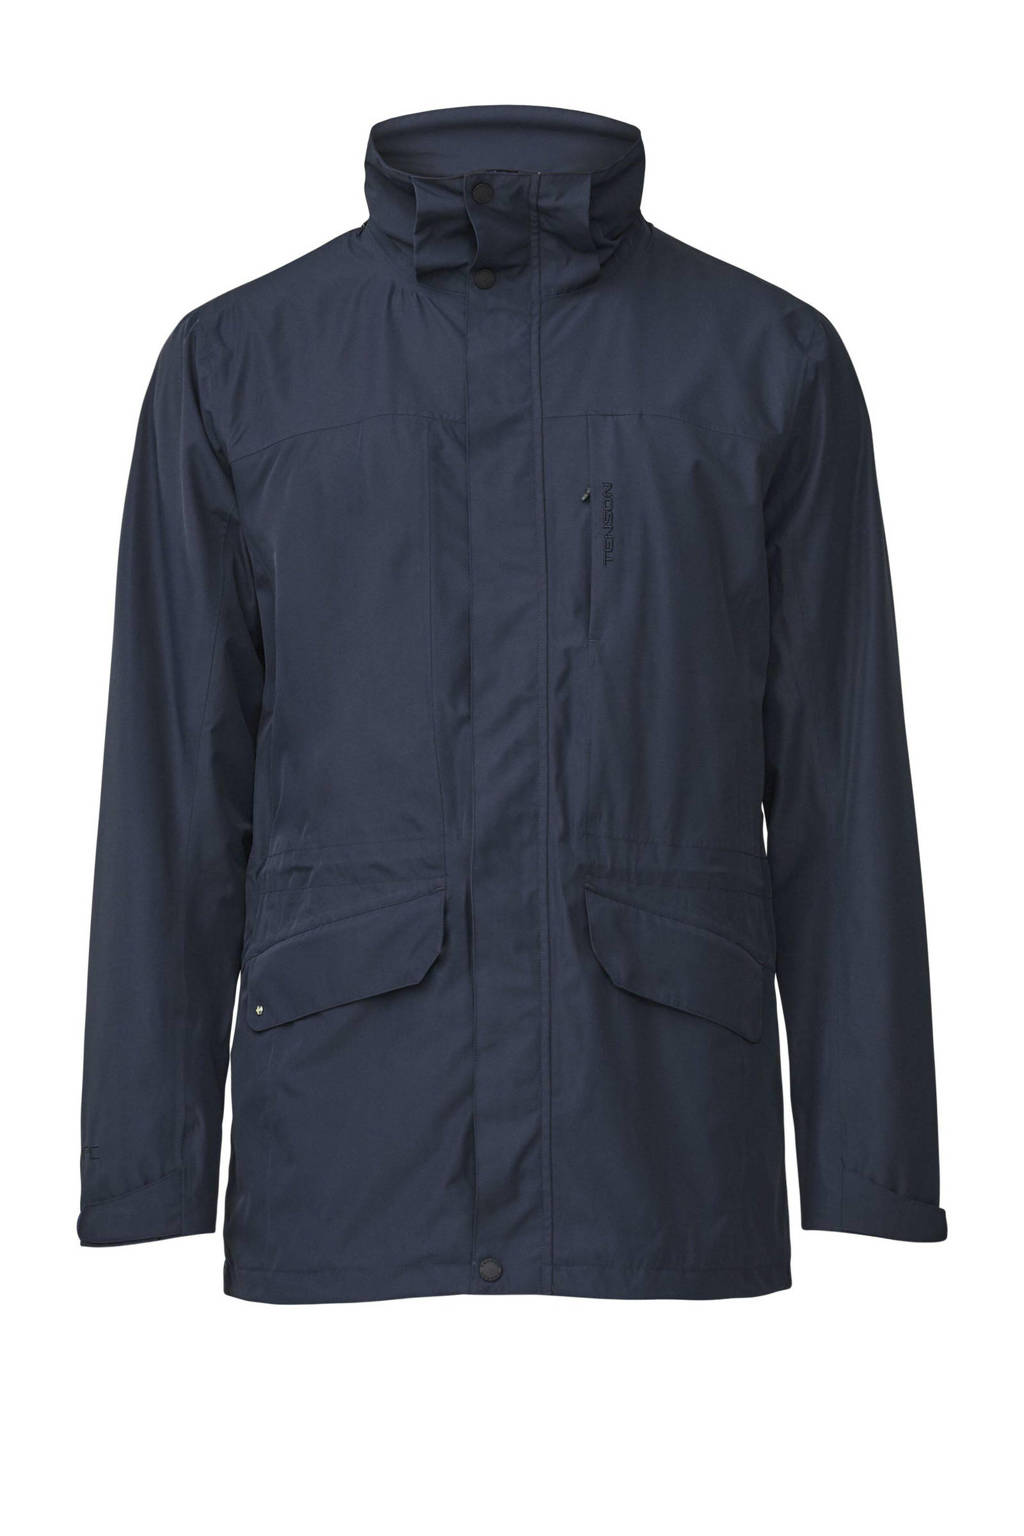 Tenson outdoor jas George donkerblauw, Donkerblauw